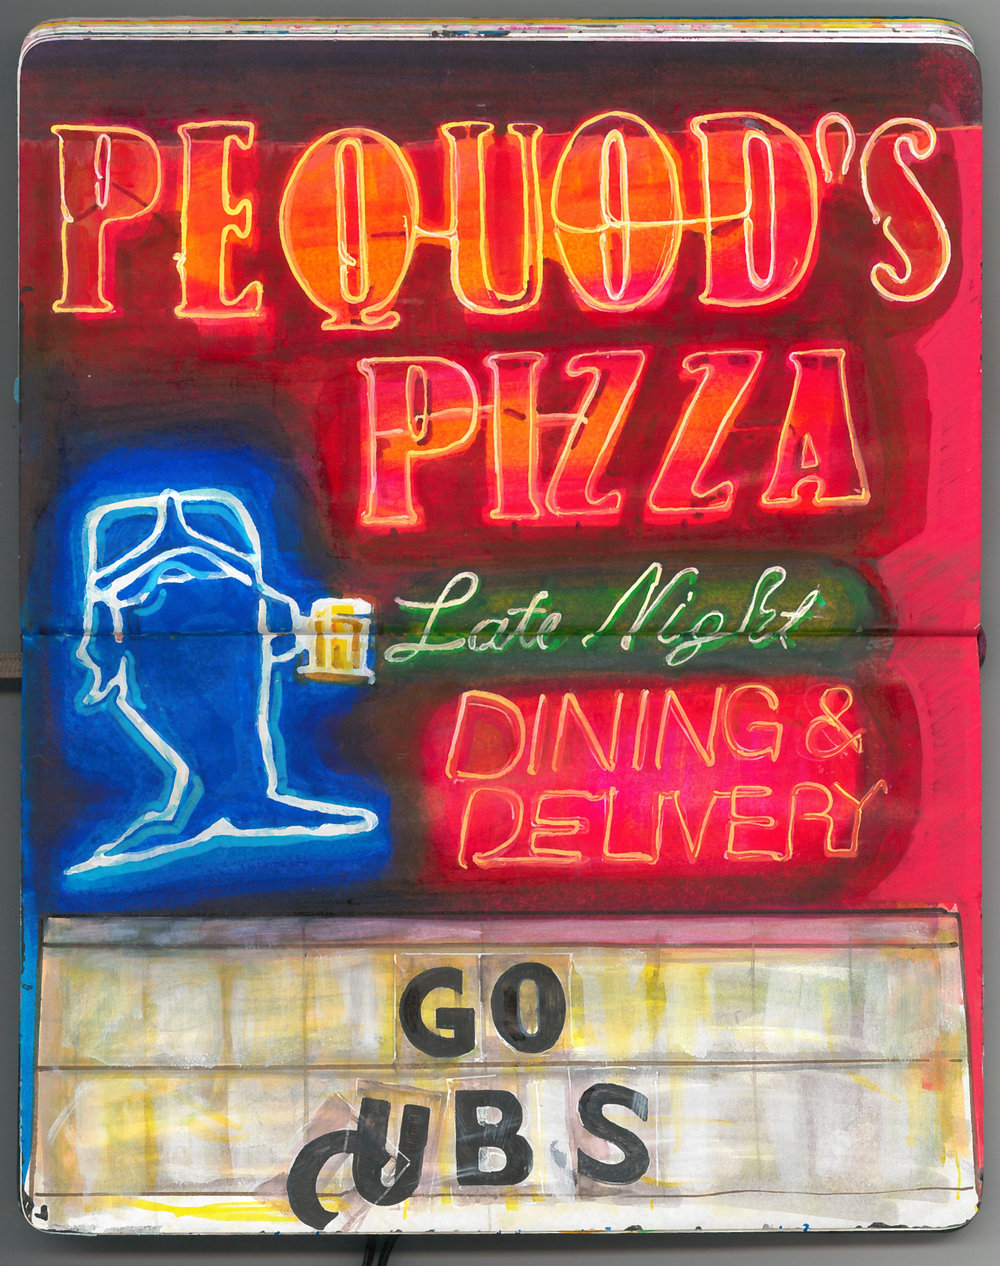 pequod's.jpg